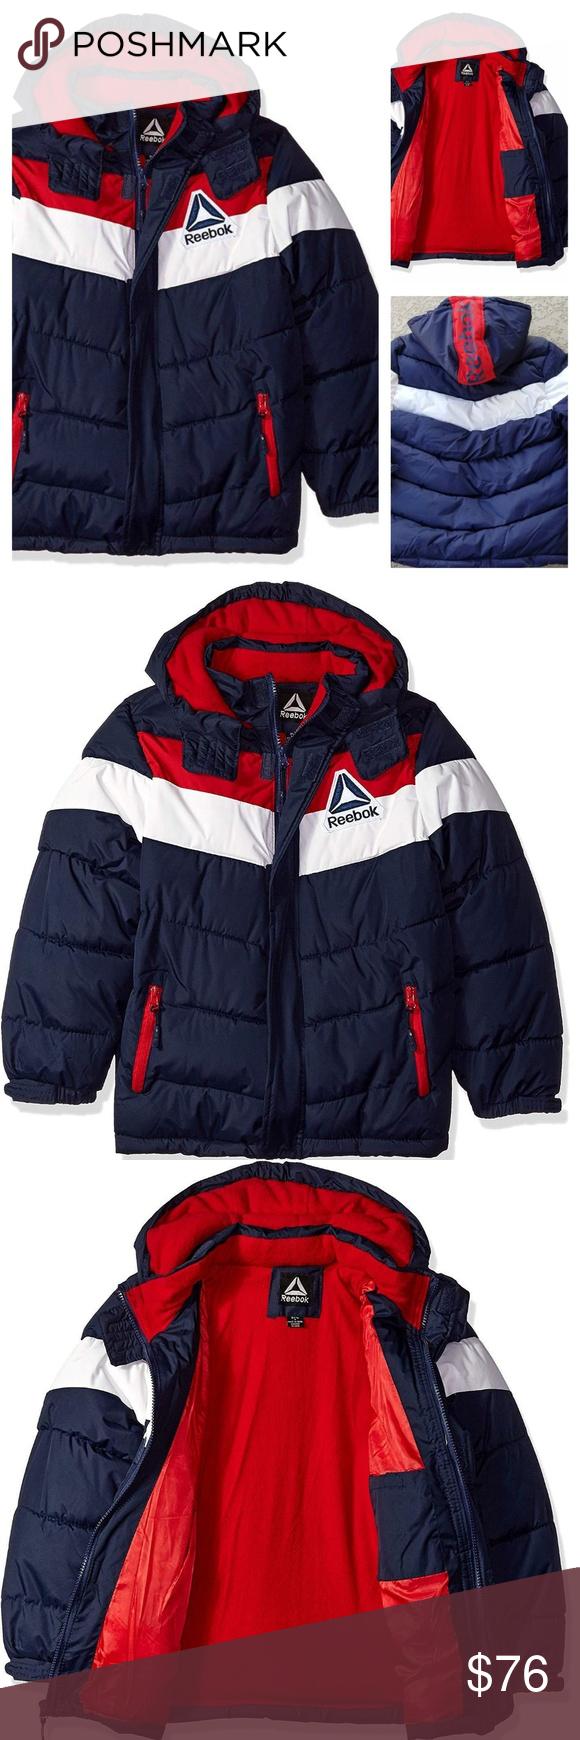 Nwt Reebok Boys Winter Puffer Jacket Hooded Size 8 Clothes Design Winter Puffer Jackets Fashion [ 1740 x 580 Pixel ]